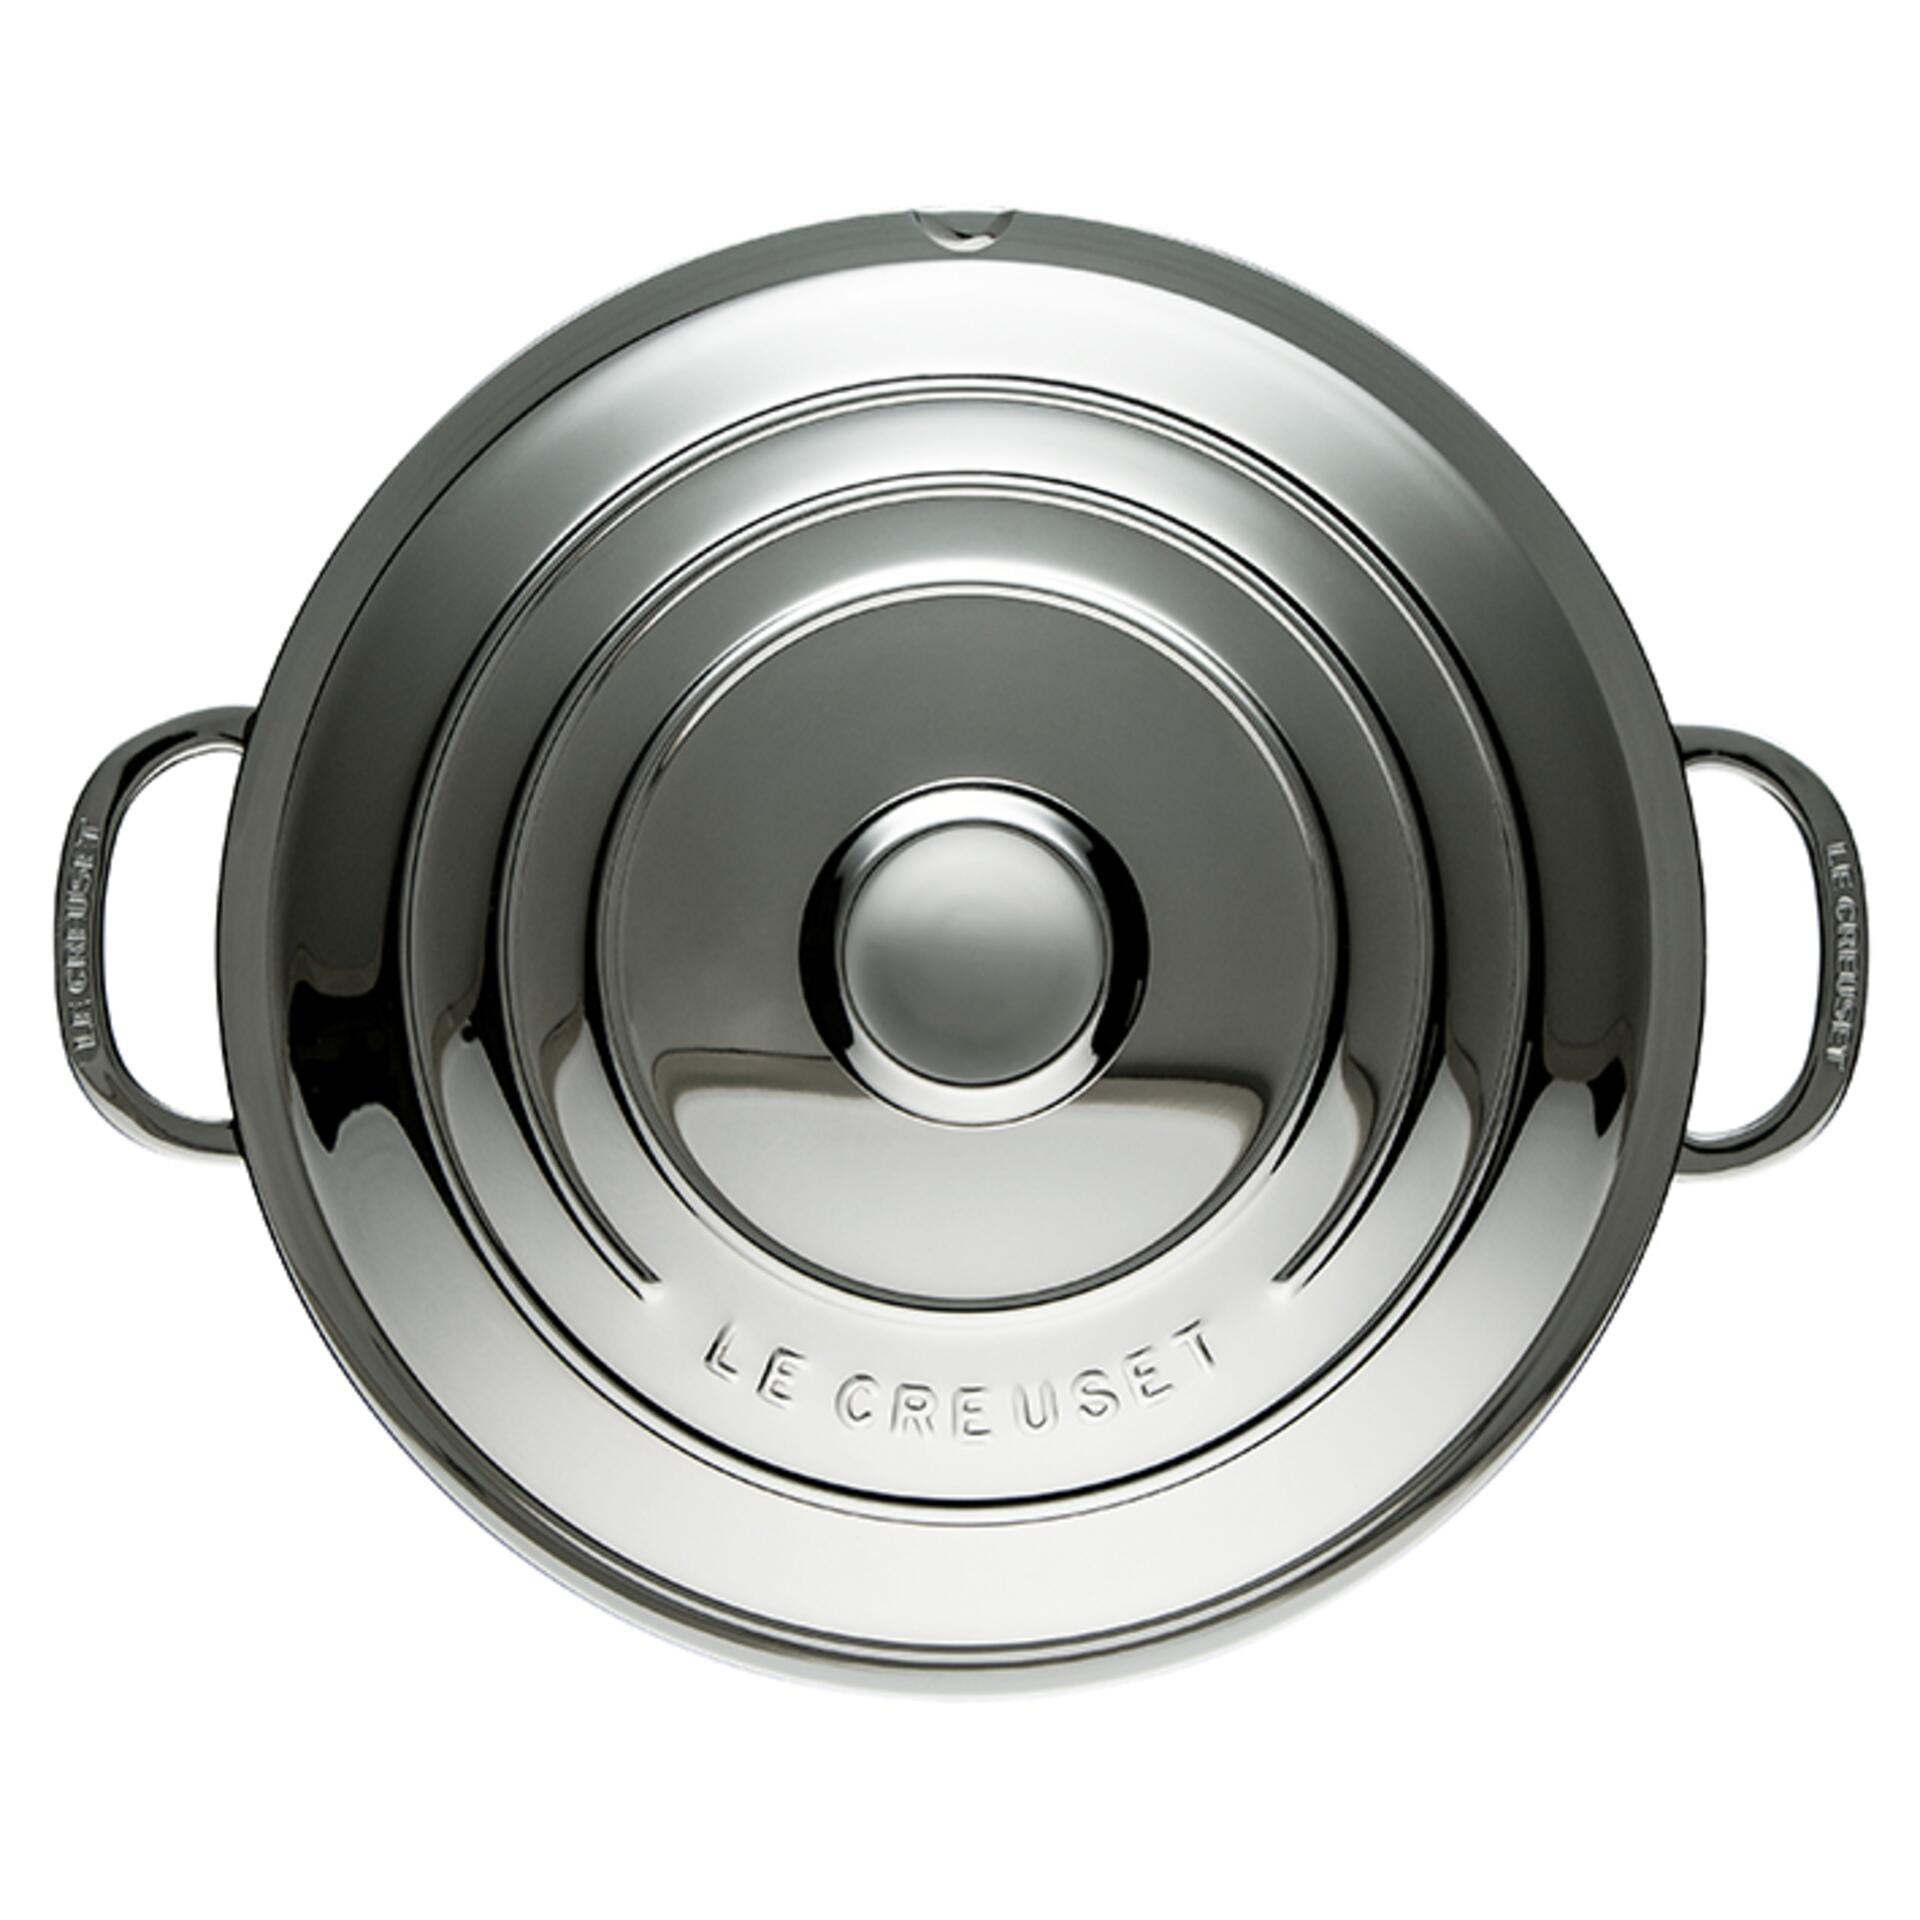 Le Creuset 3-ply PLUS Fleischtopf 20 cm